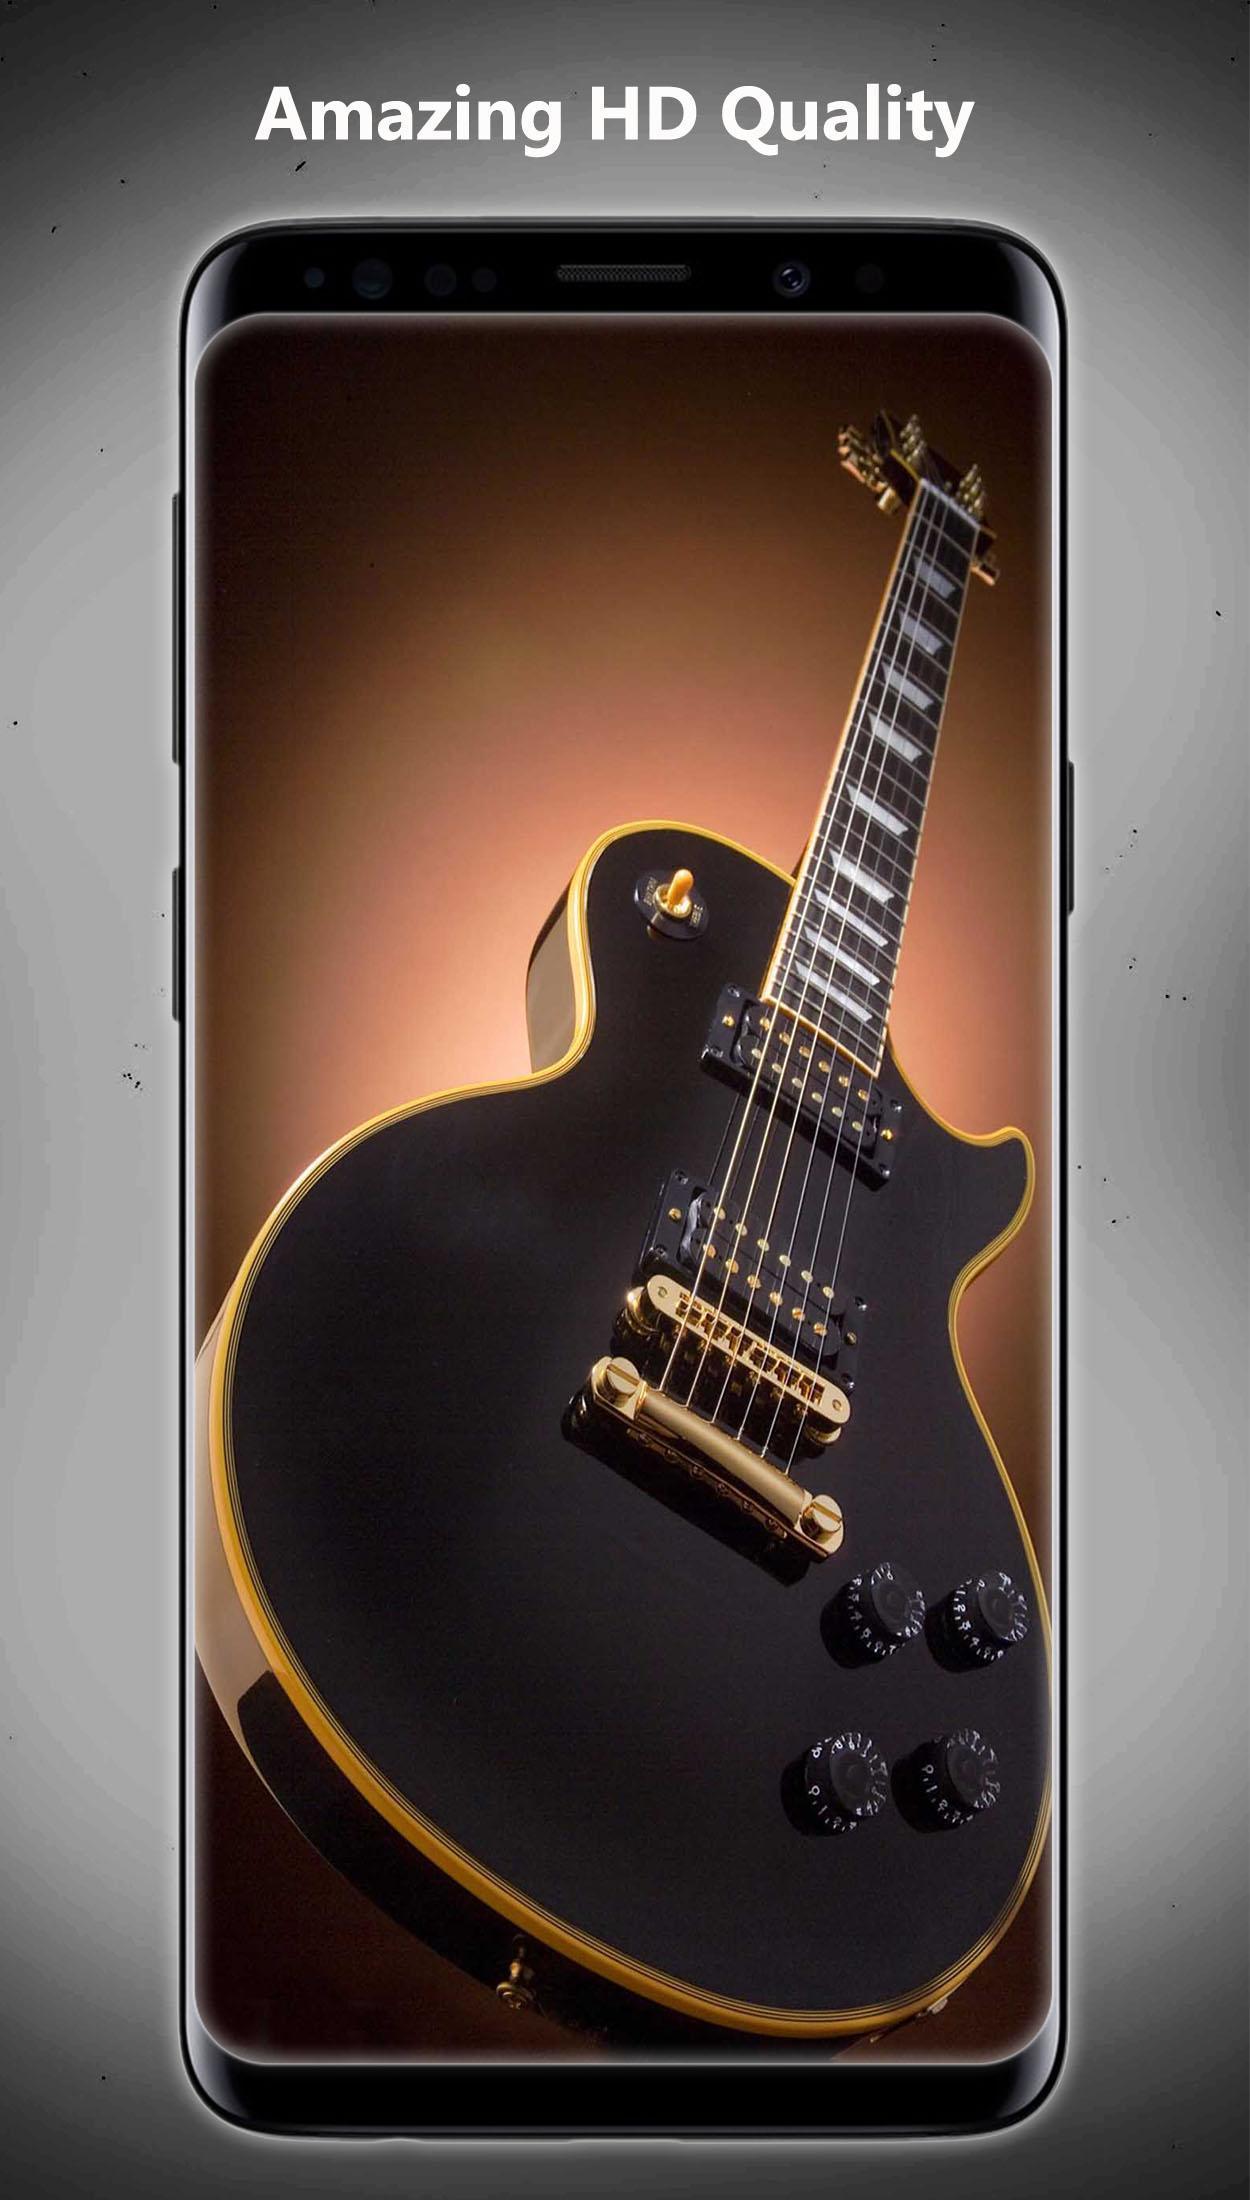 Guitar Wallpaper 4k For Android Apk Download